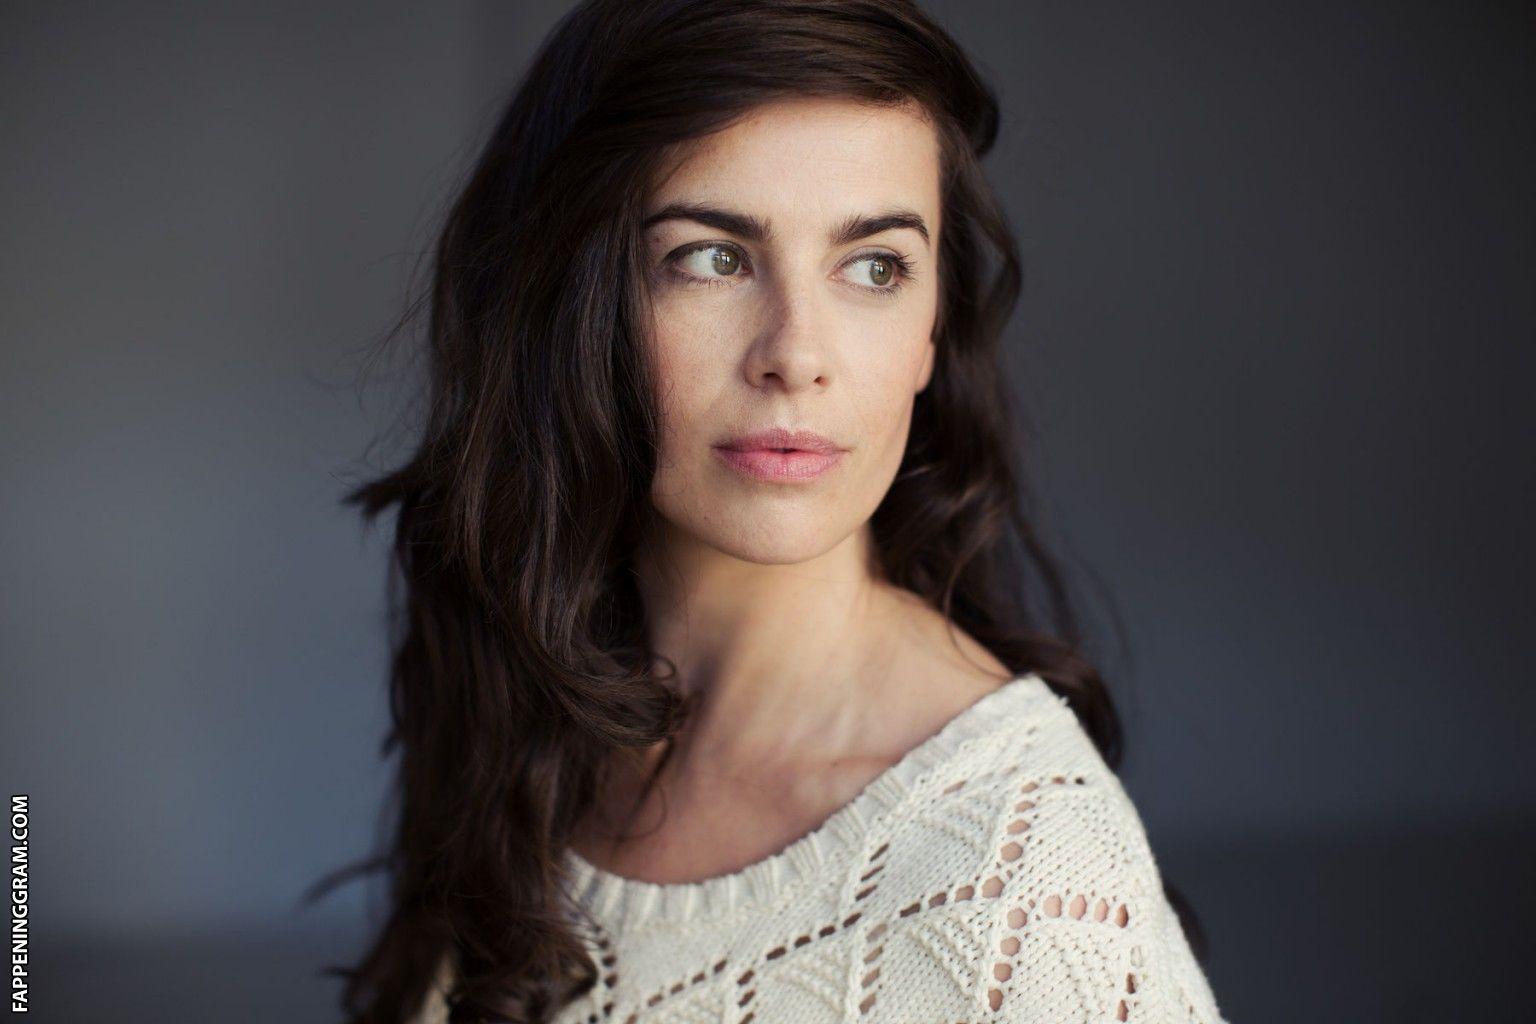 Julia-Maria Koehler Nude The Fappening - FappeningGram